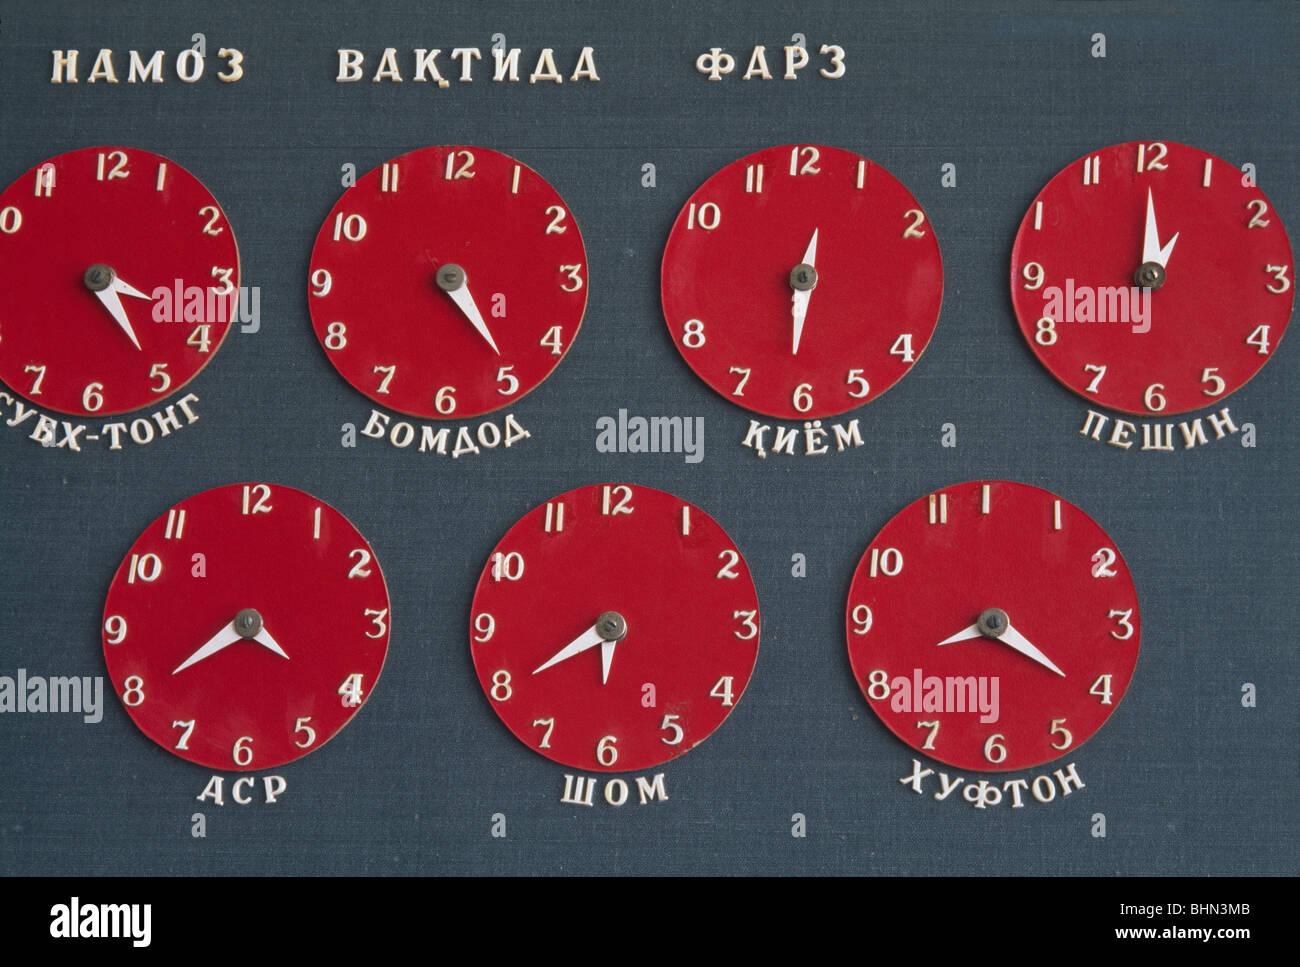 Religious timetable at Barak Khan Medressa, Tashkent, Uzbekistan - Stock Image